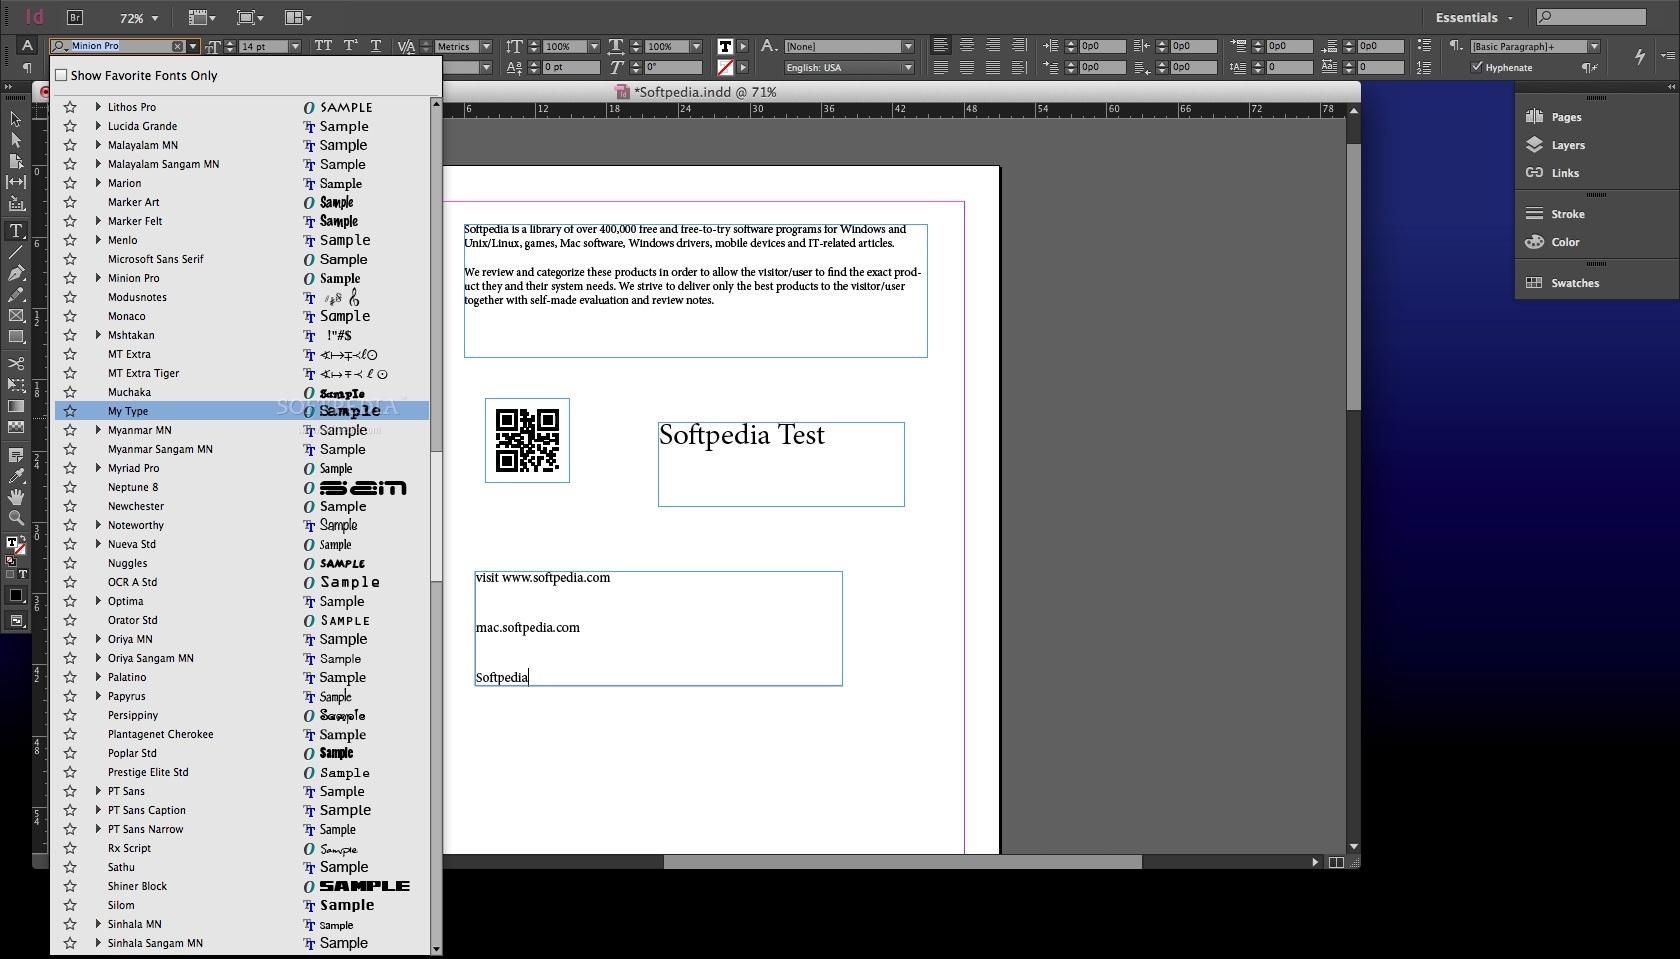 Adobe InDesign Mac CC 2018 14 0 - Download